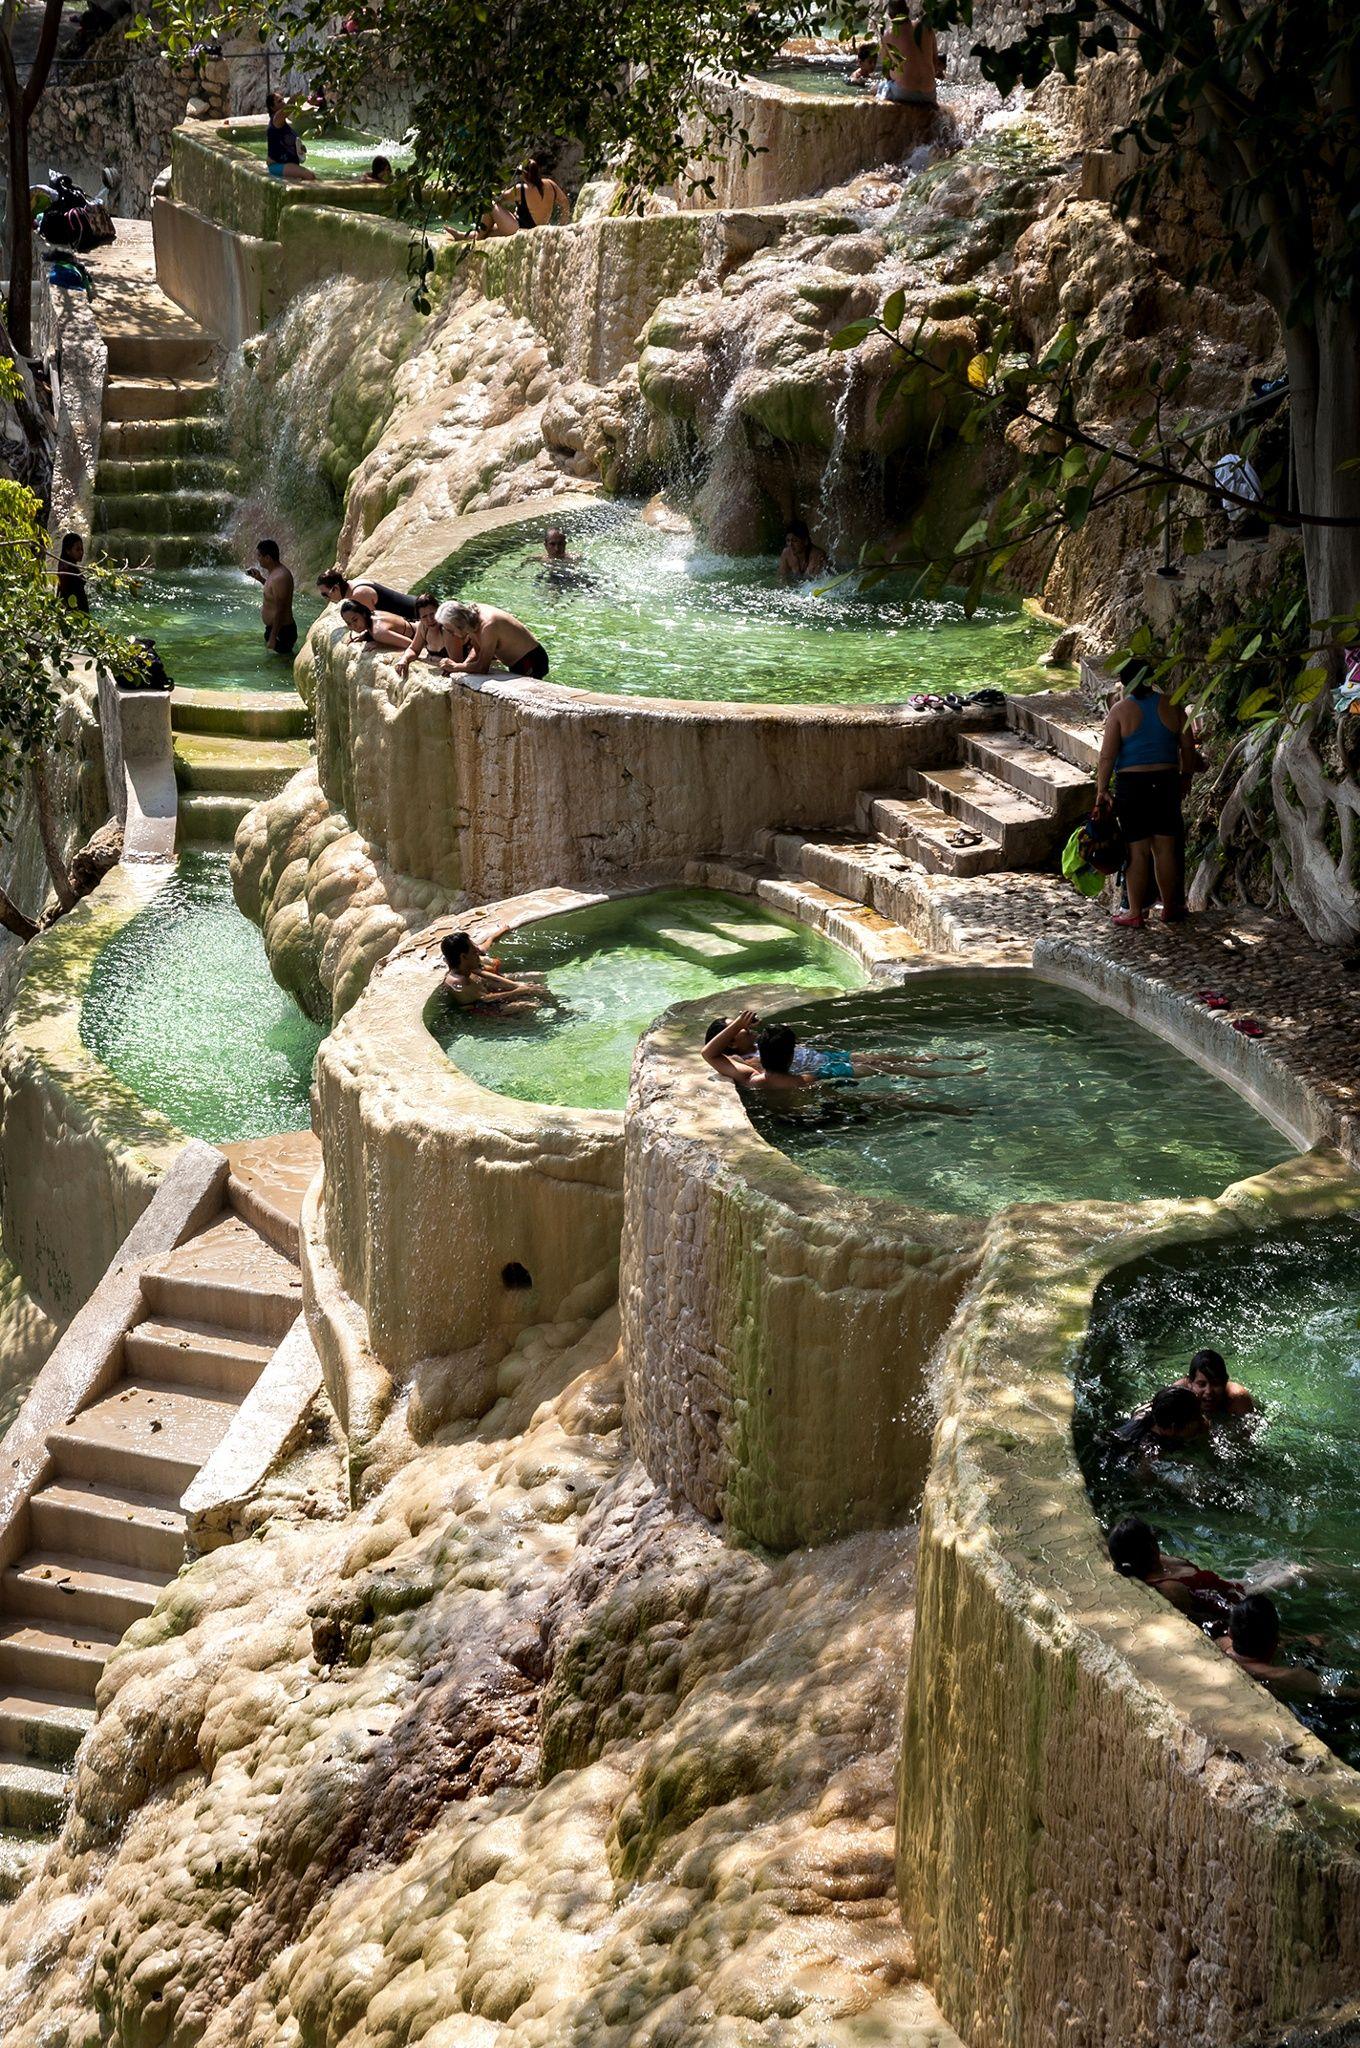 Grutas de Tolantongo natural hot springs in Hidalgo, Mexico. - Explore the World, one Country at a Time. http://TravelNerdNici.com